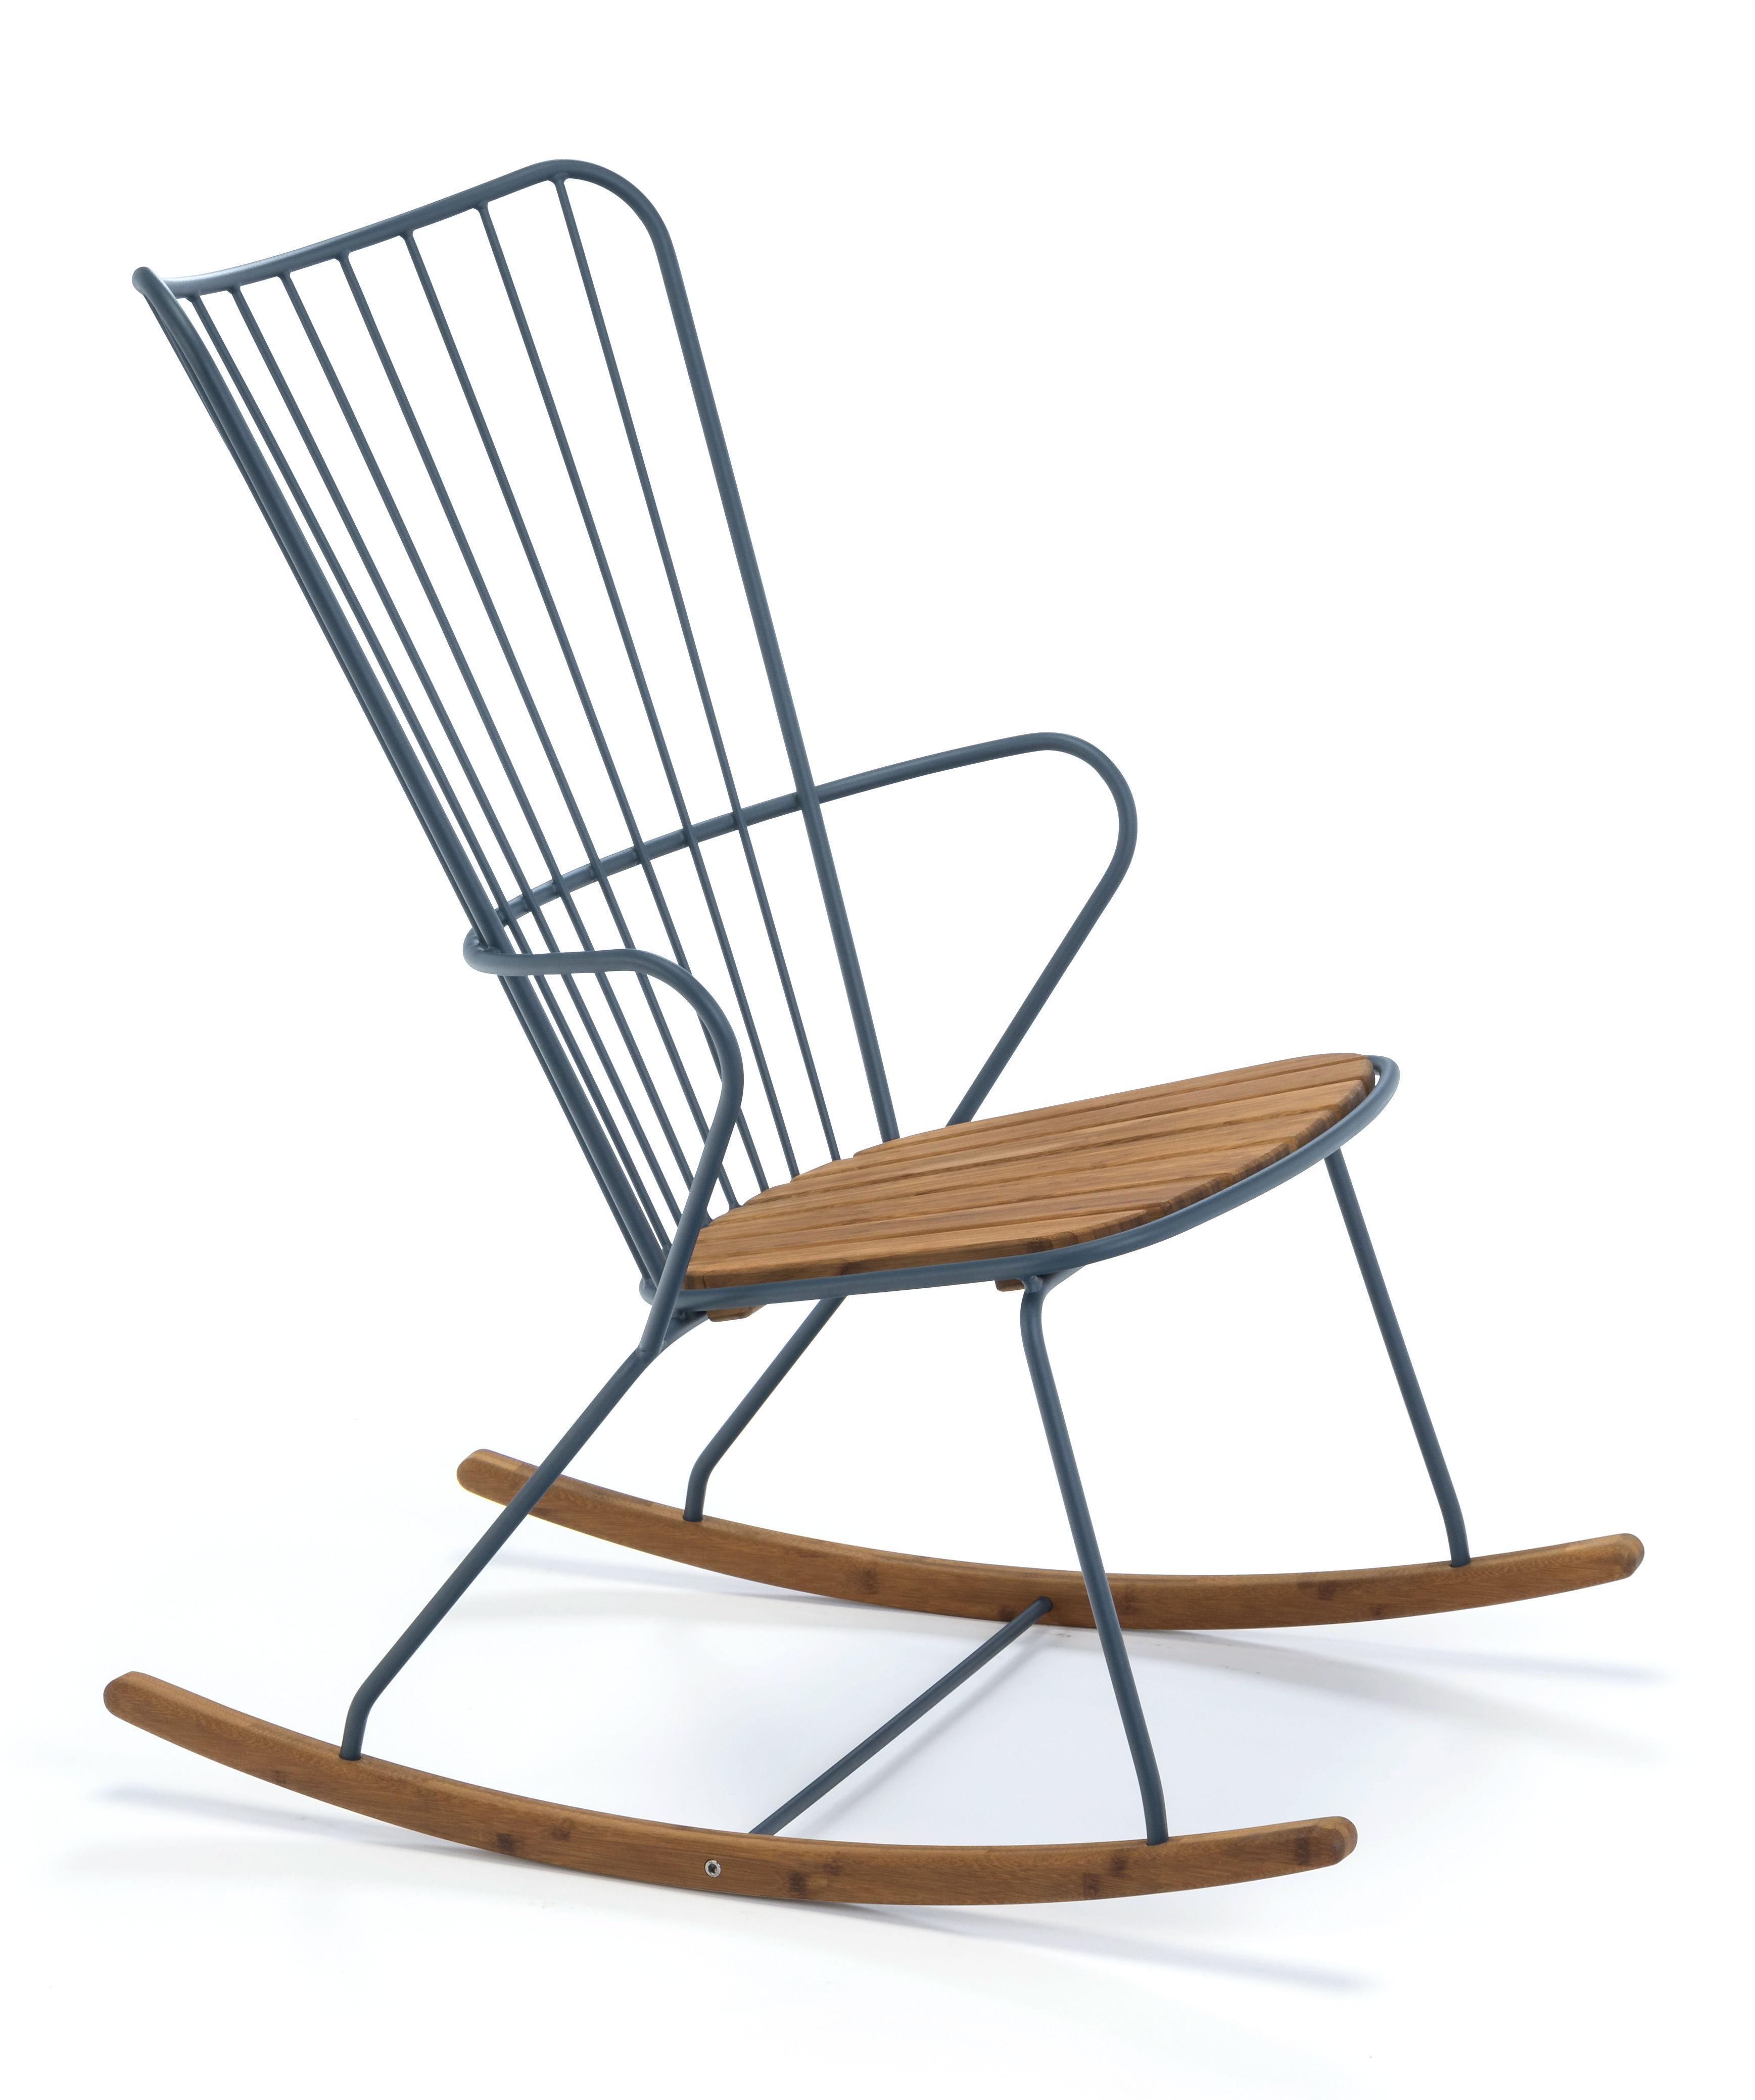 Interni - Oggetti déco - Rocking chair Paon - / Metallo & bambù di Houe - Blu - Acciaio verniciato a polvere, Bambù